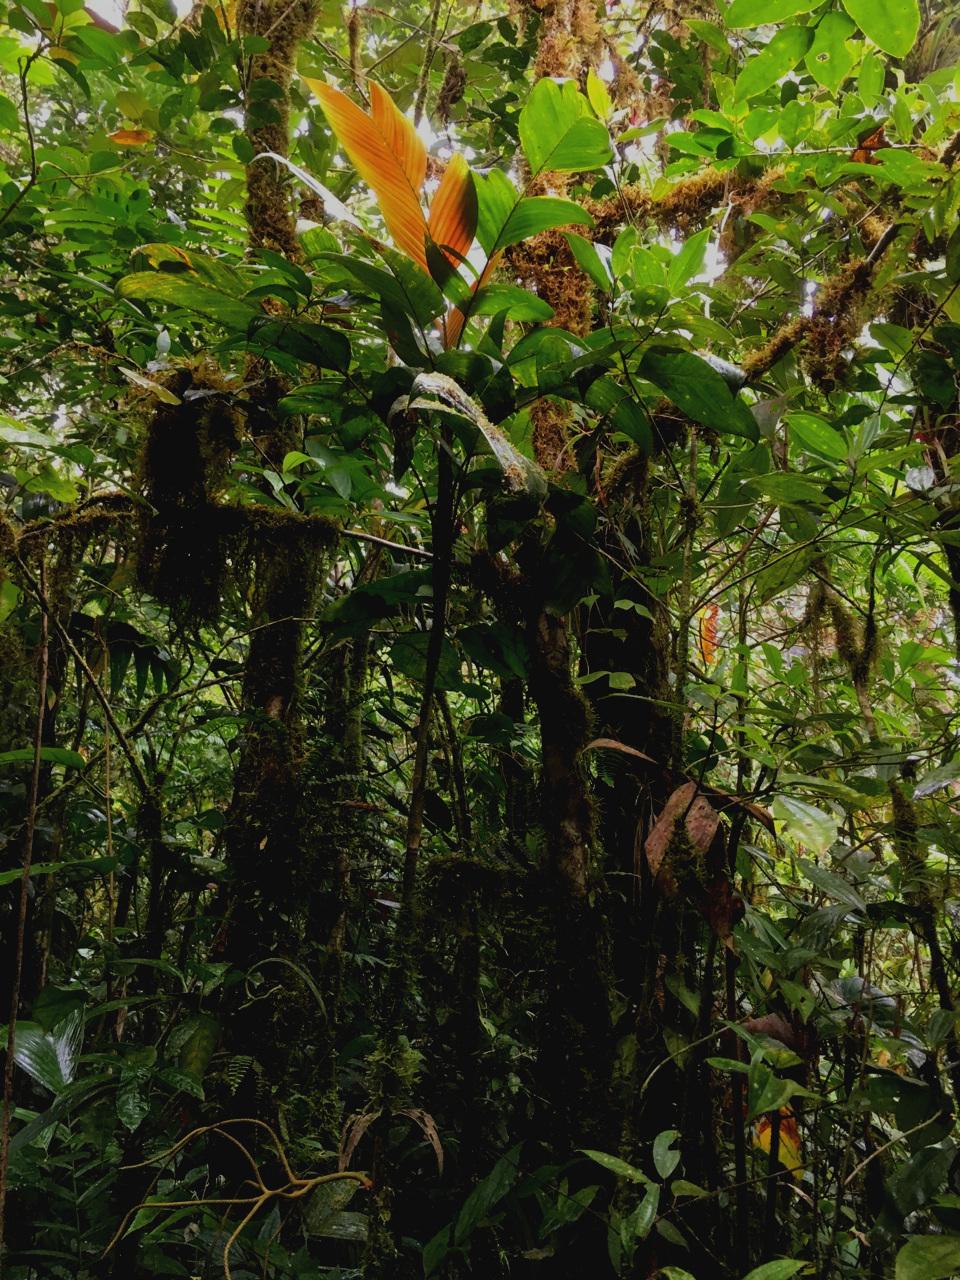 Backlit  Geonoma sp.  Costa Rica. (Image: F. Muller).